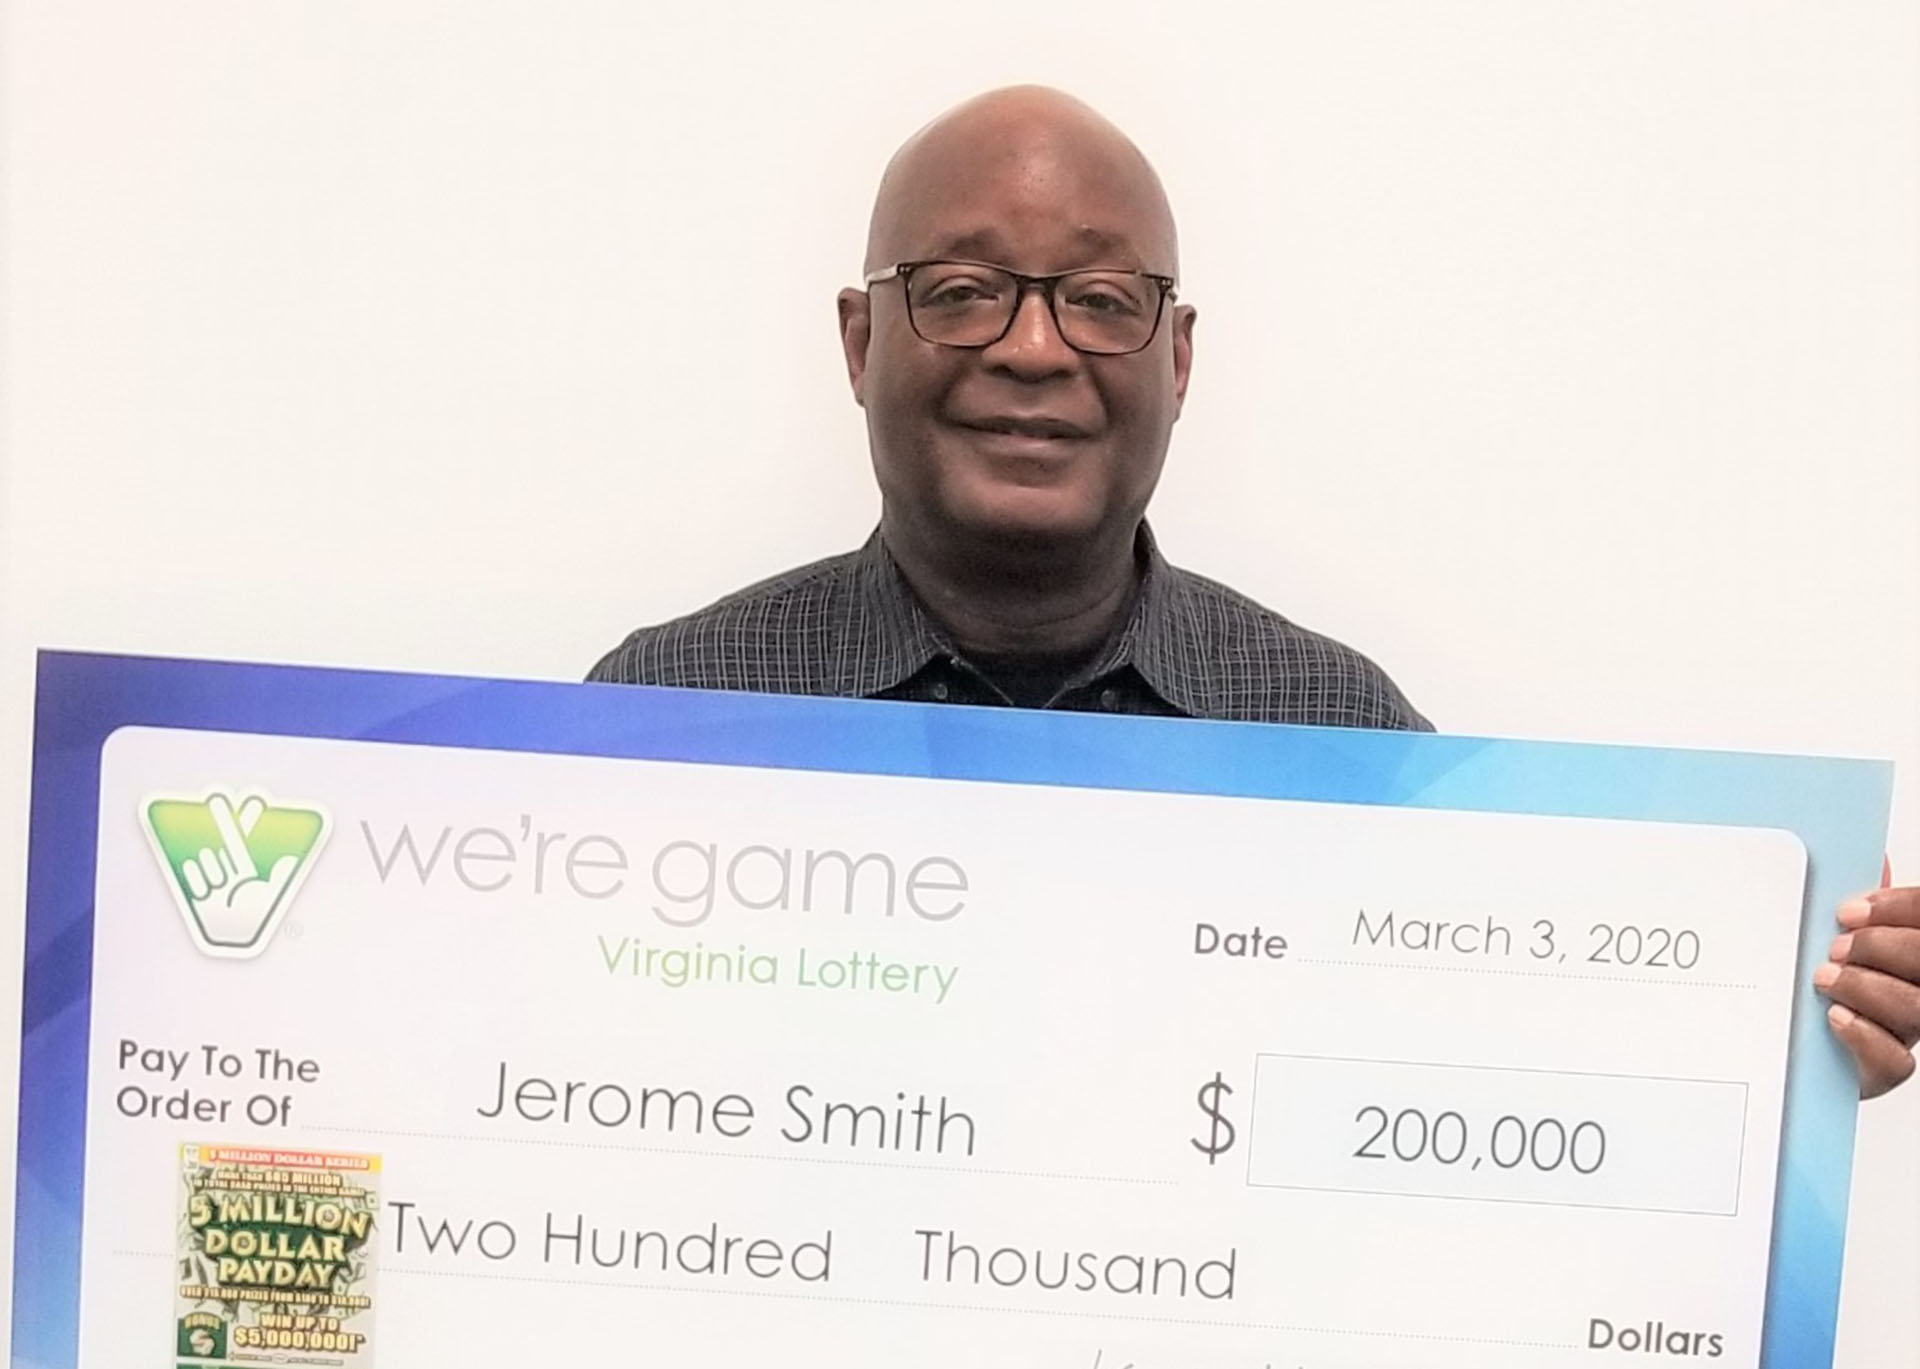 Winning Virginia Lottery ticket bought in Woodbridge